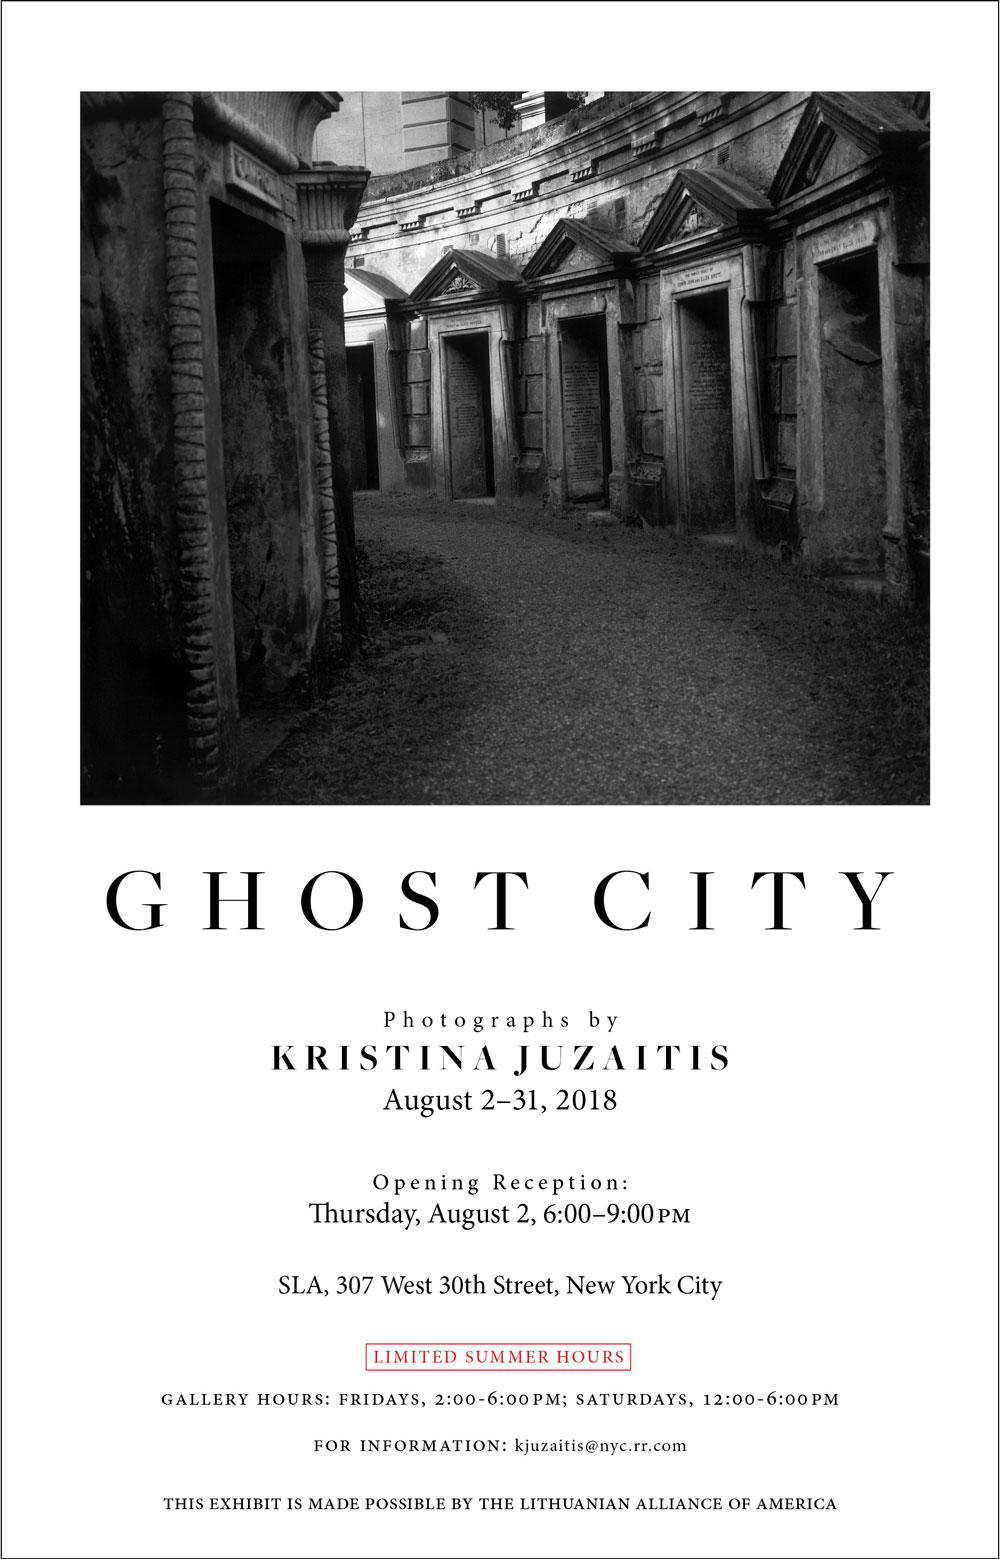 Ghost-City-Evite_07.29.18-HiGateWeb.jpg